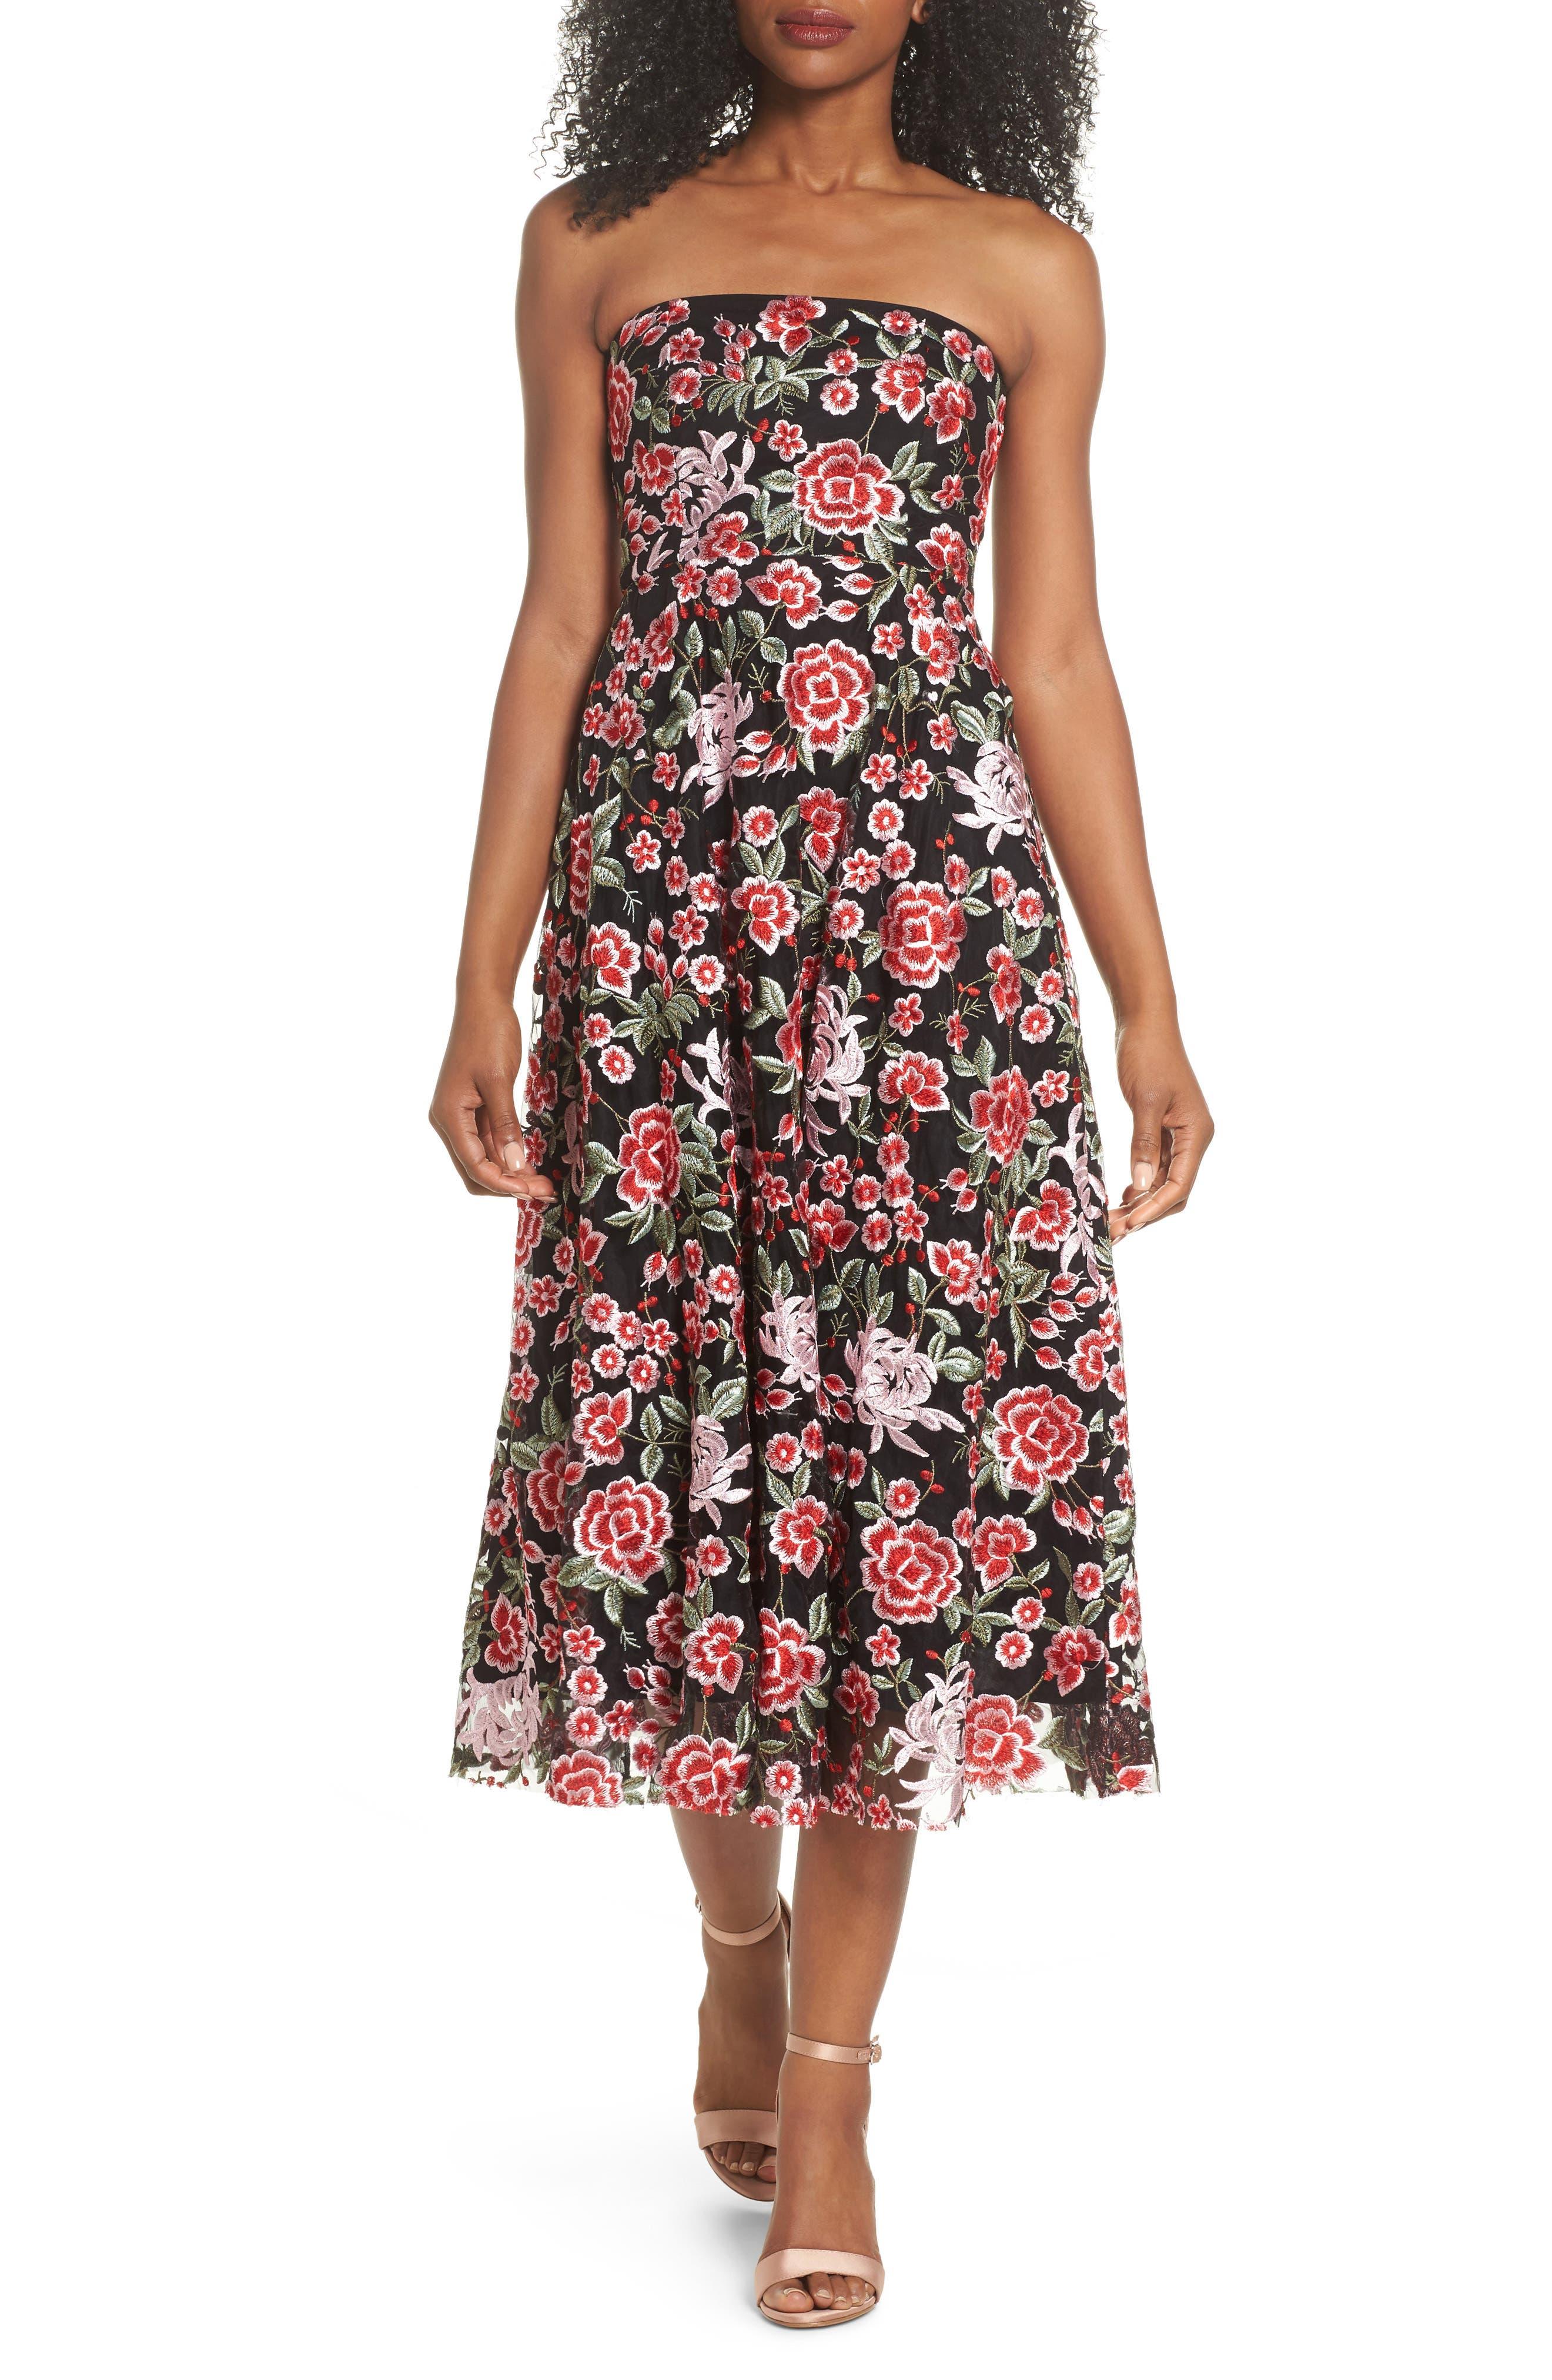 Cosette Embroidered Strapless Dress,                         Main,                         color, Black Multi